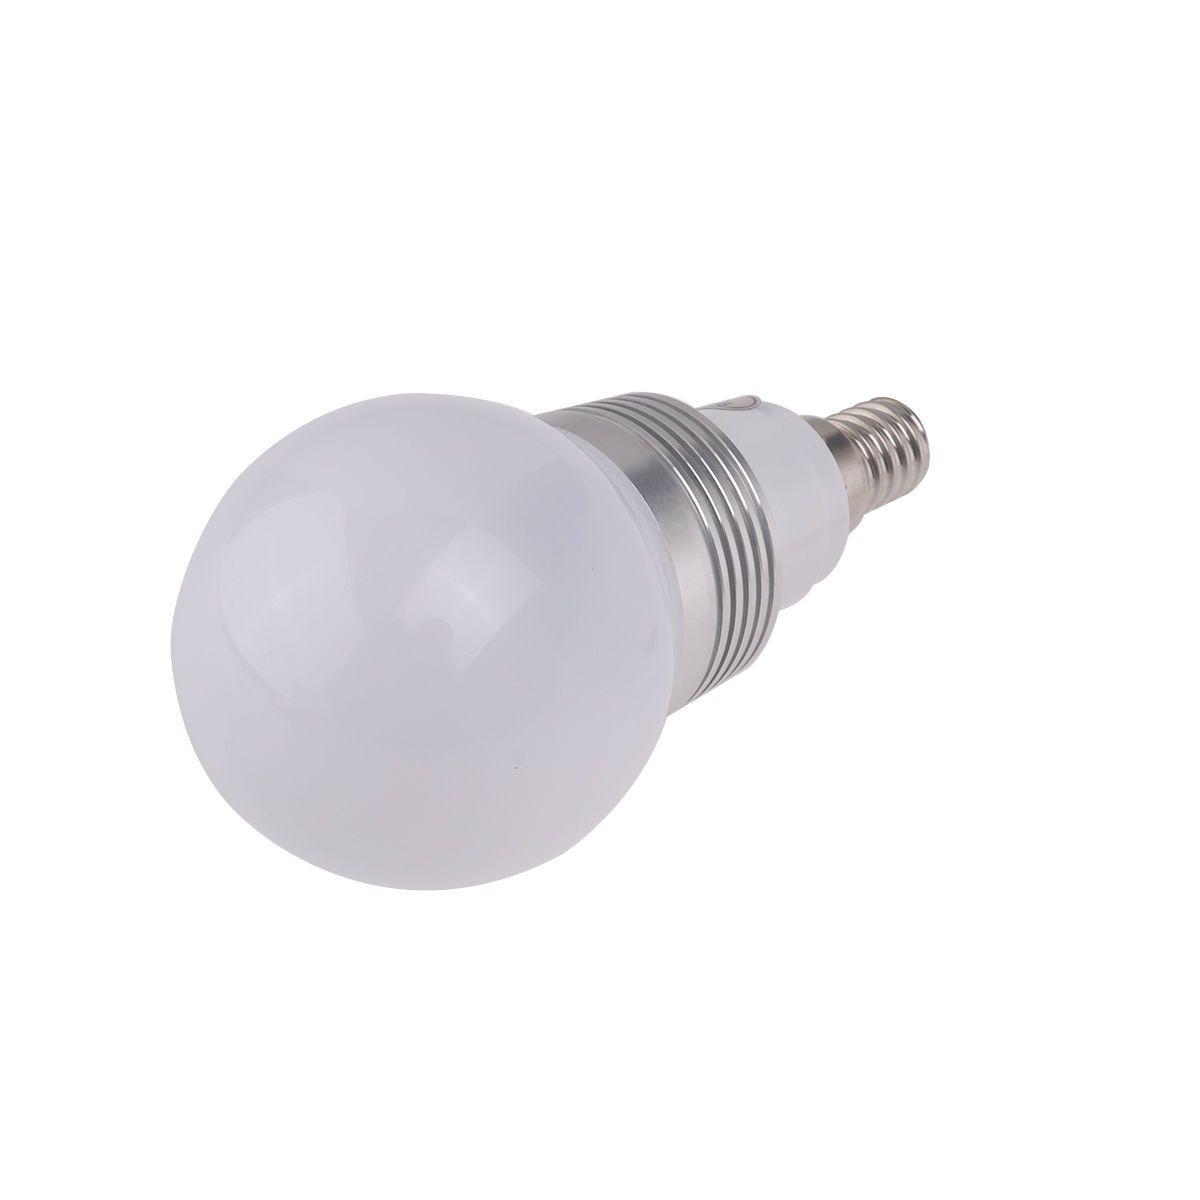 E14 AC 230V 3W 16 Farben Ändern des RGB-LED-Lampenlichts + IR-Fernbedienung